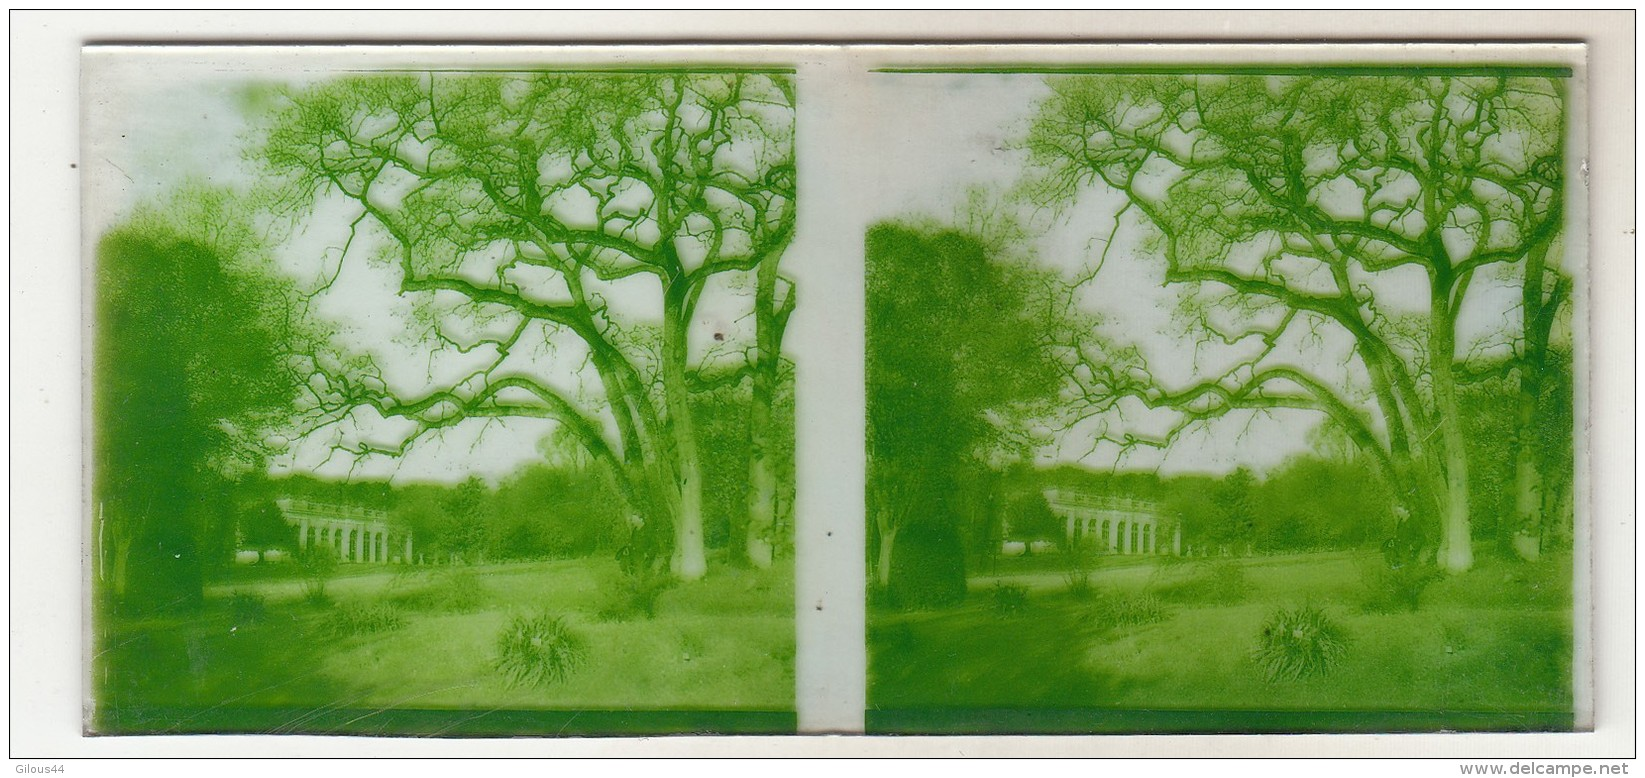 3 Photo Stereoscopique  Trianon Parc De Versailles - Plaques De Verre